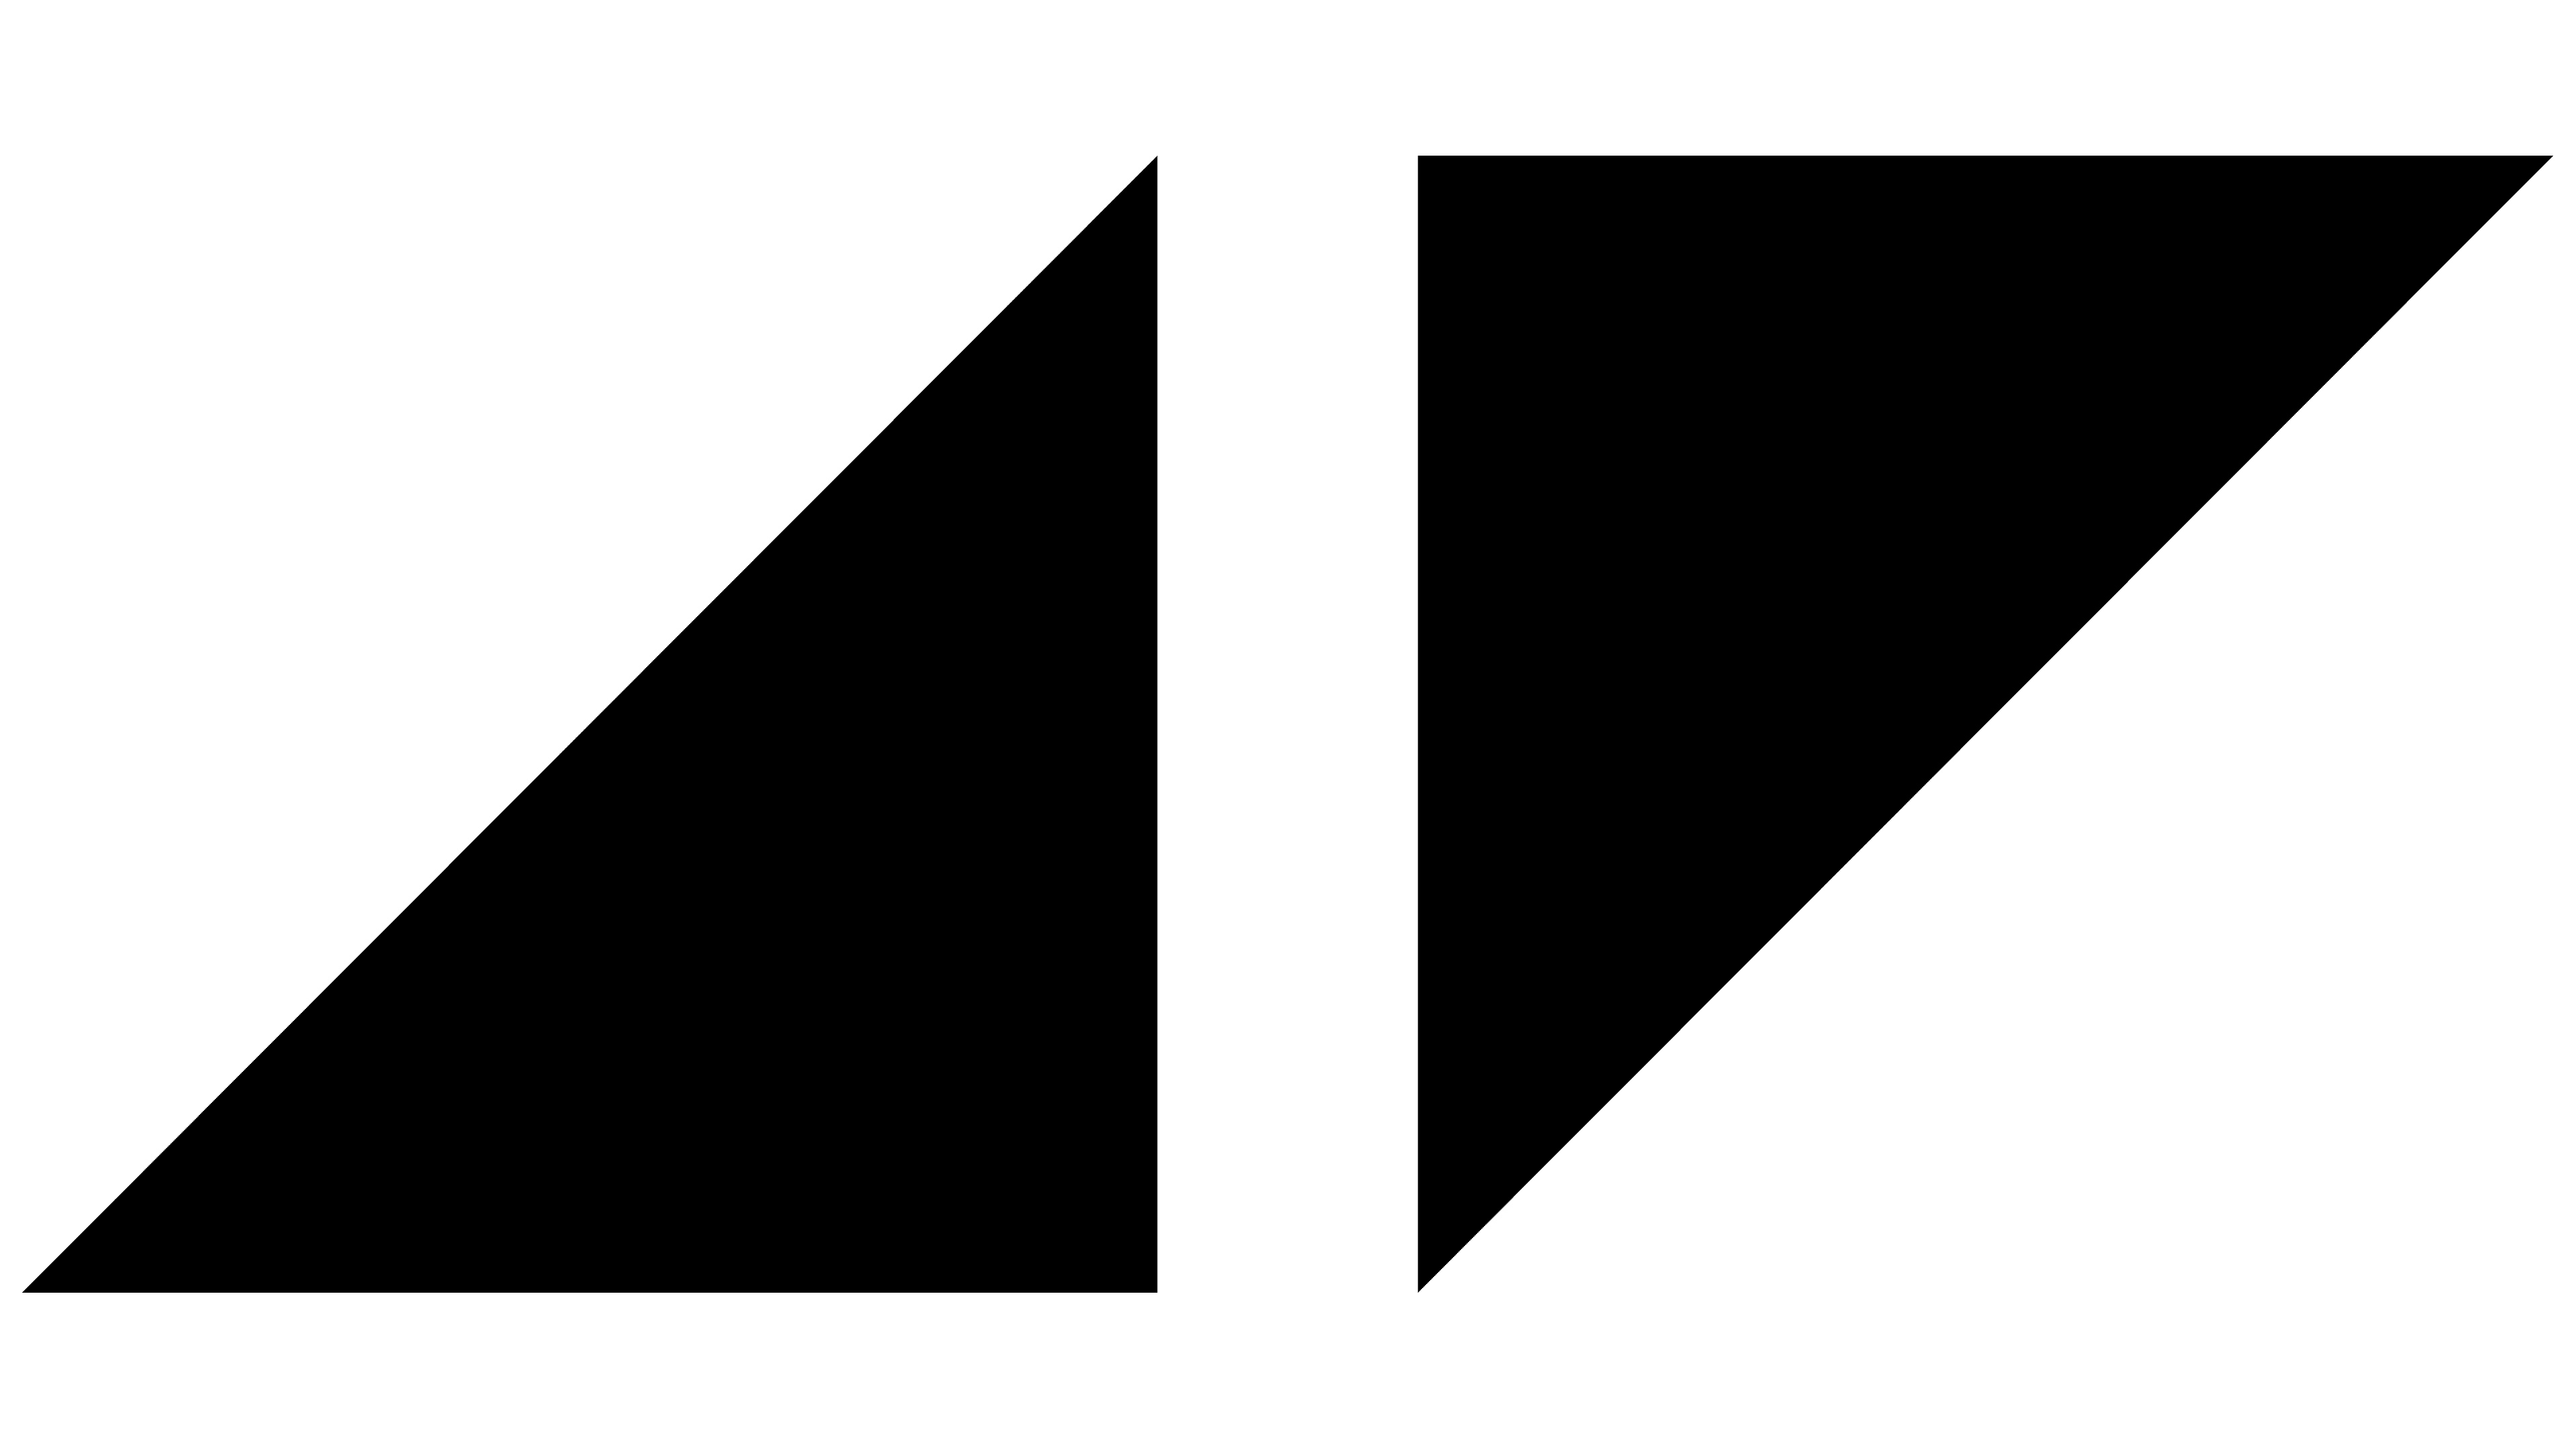 Avicii Emblem